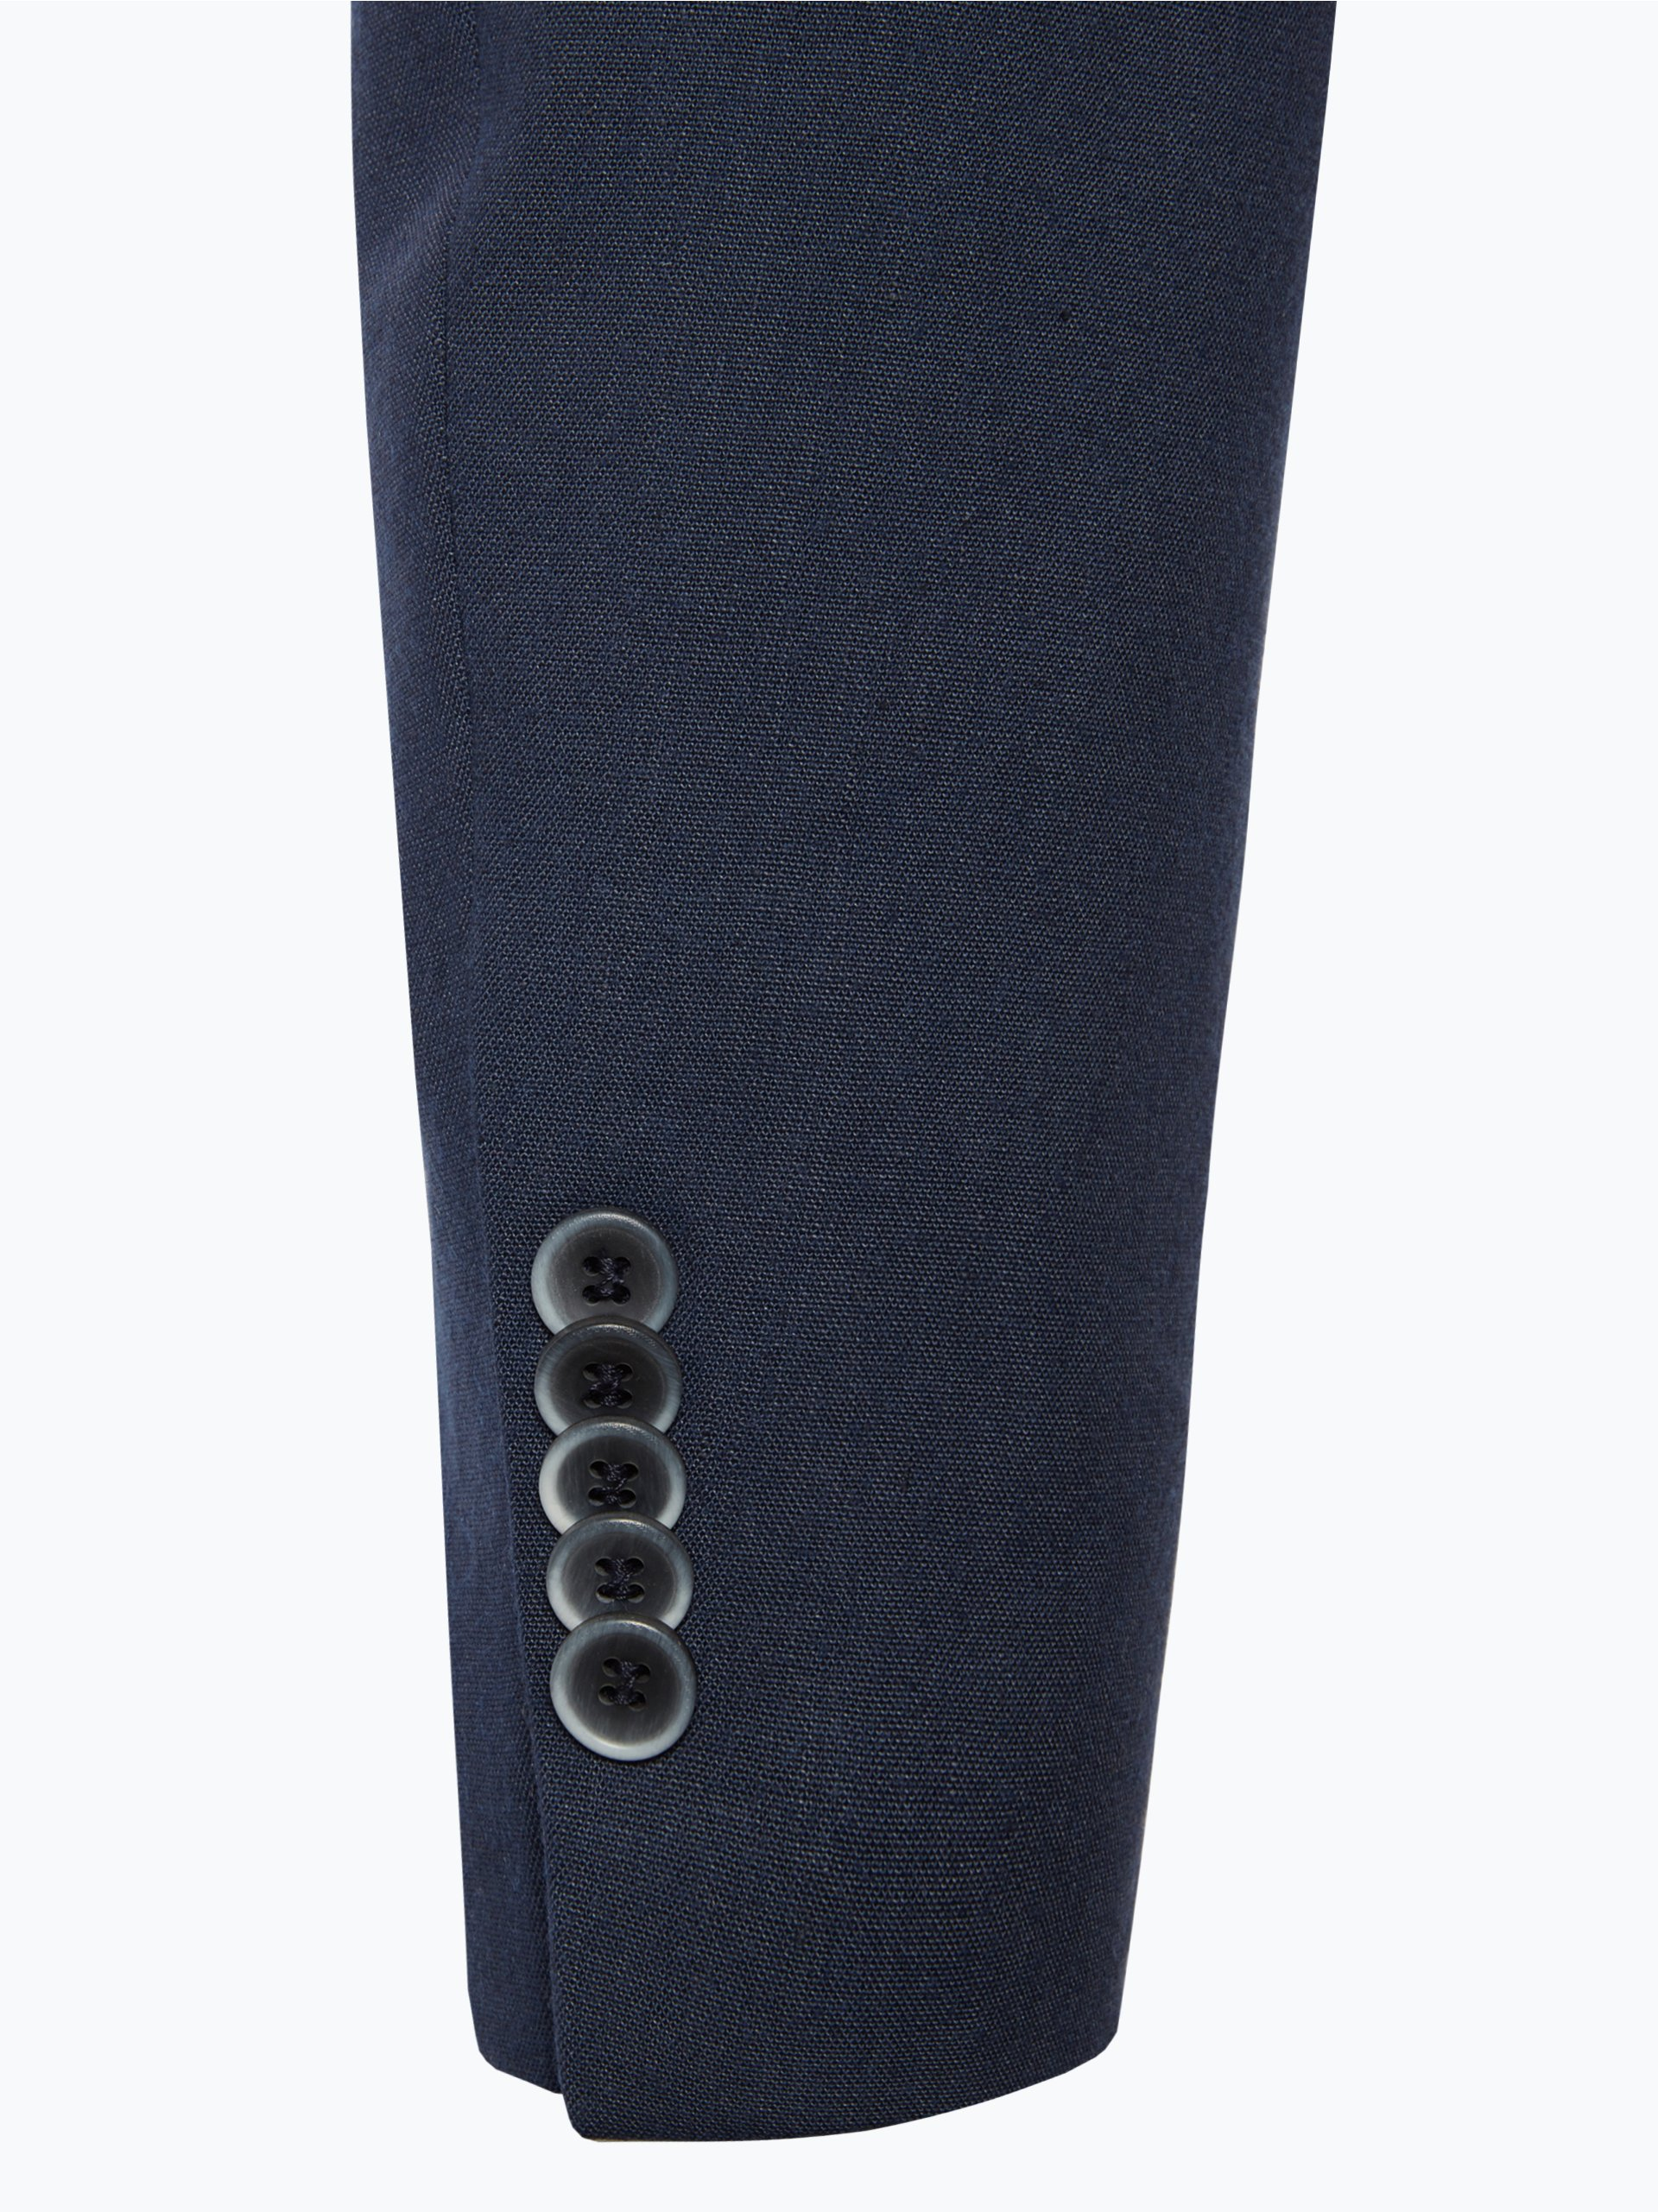 finshley harding herren anzug mit leinen anteil black. Black Bedroom Furniture Sets. Home Design Ideas